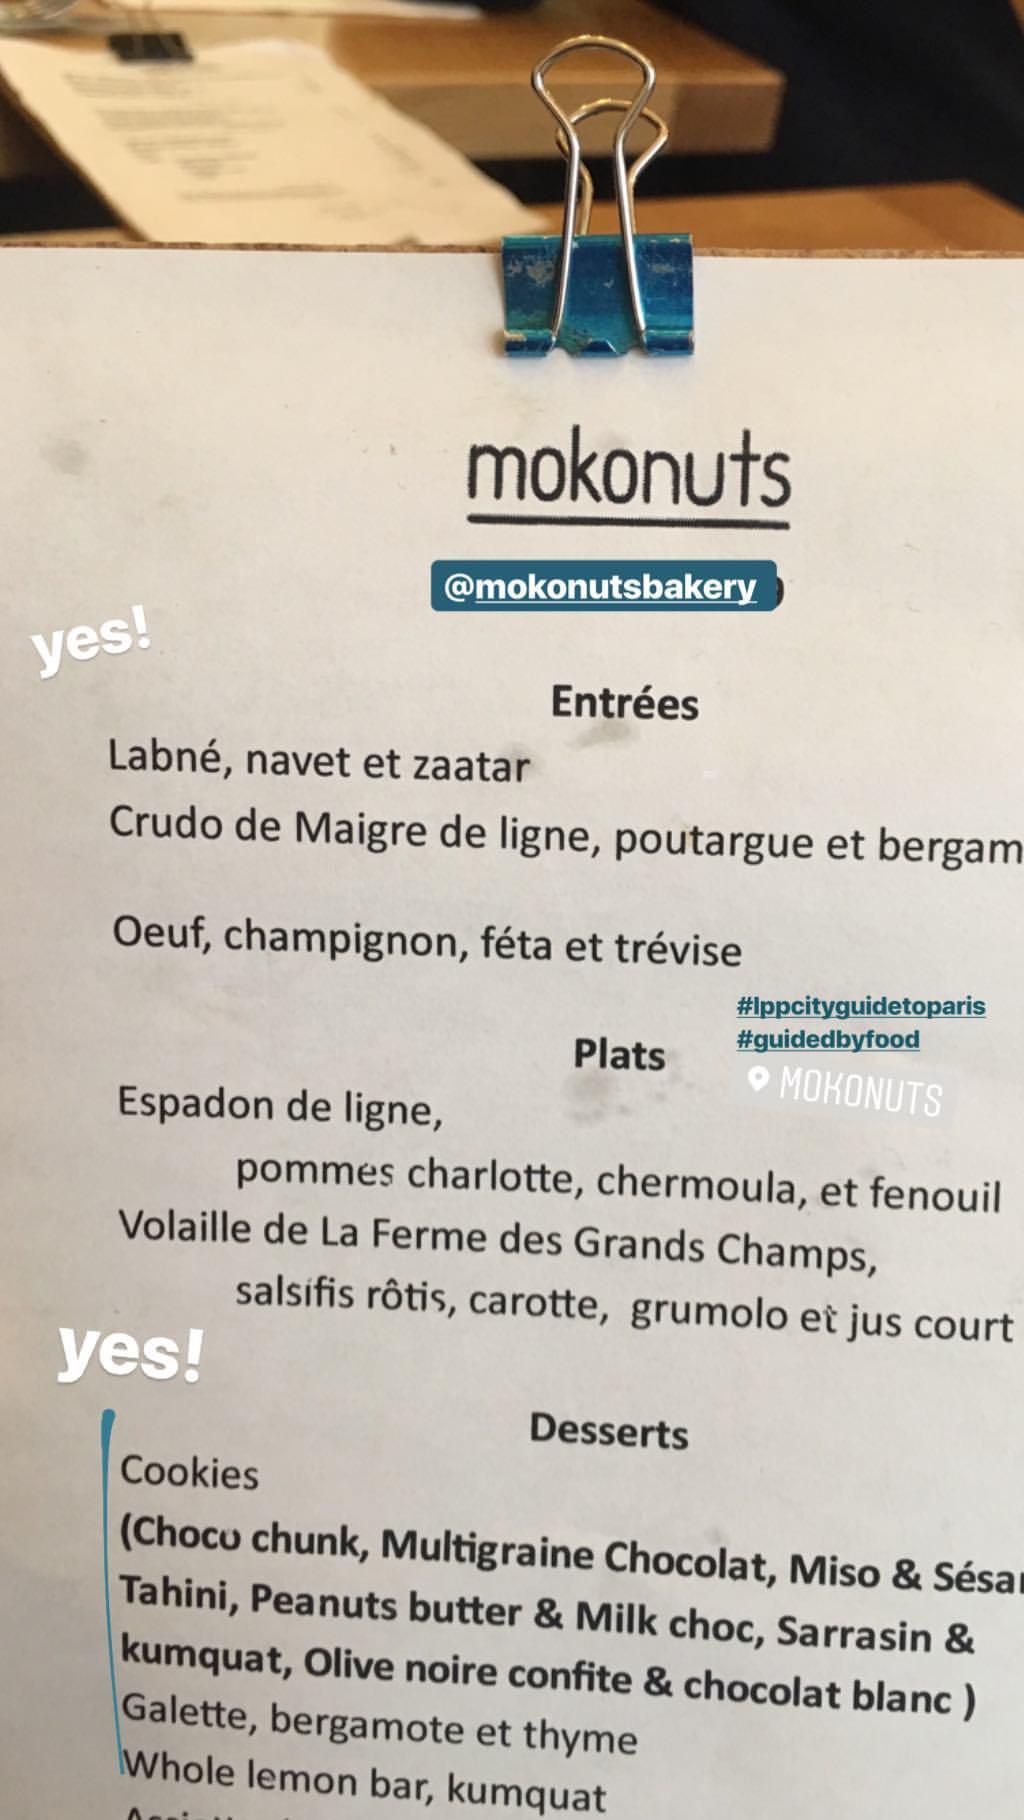 PARIS-FOOD-MOKONUTS-RESTAURANT-3.jpg